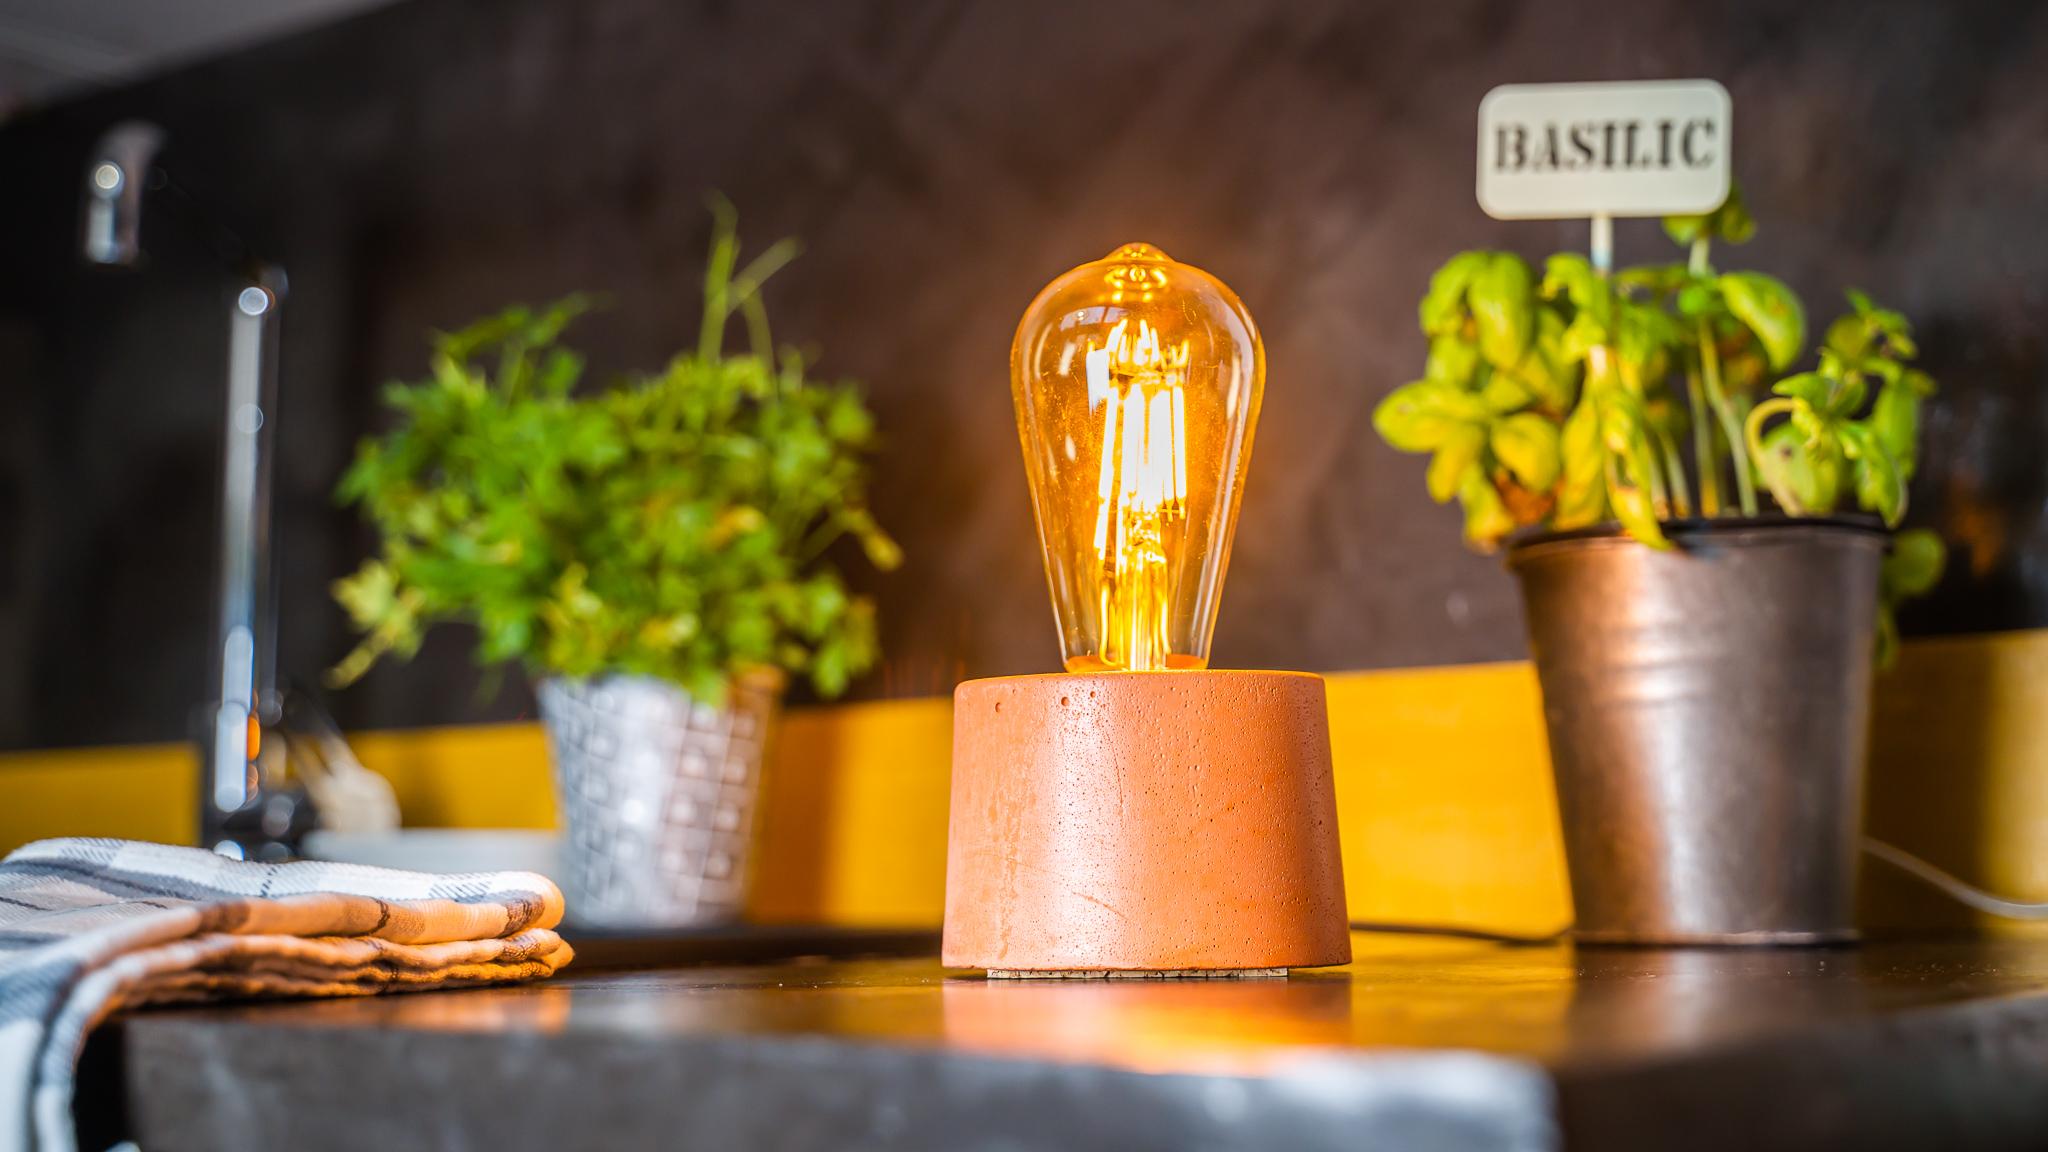 Lampe cylindrique en béton orange fabrication artisanale